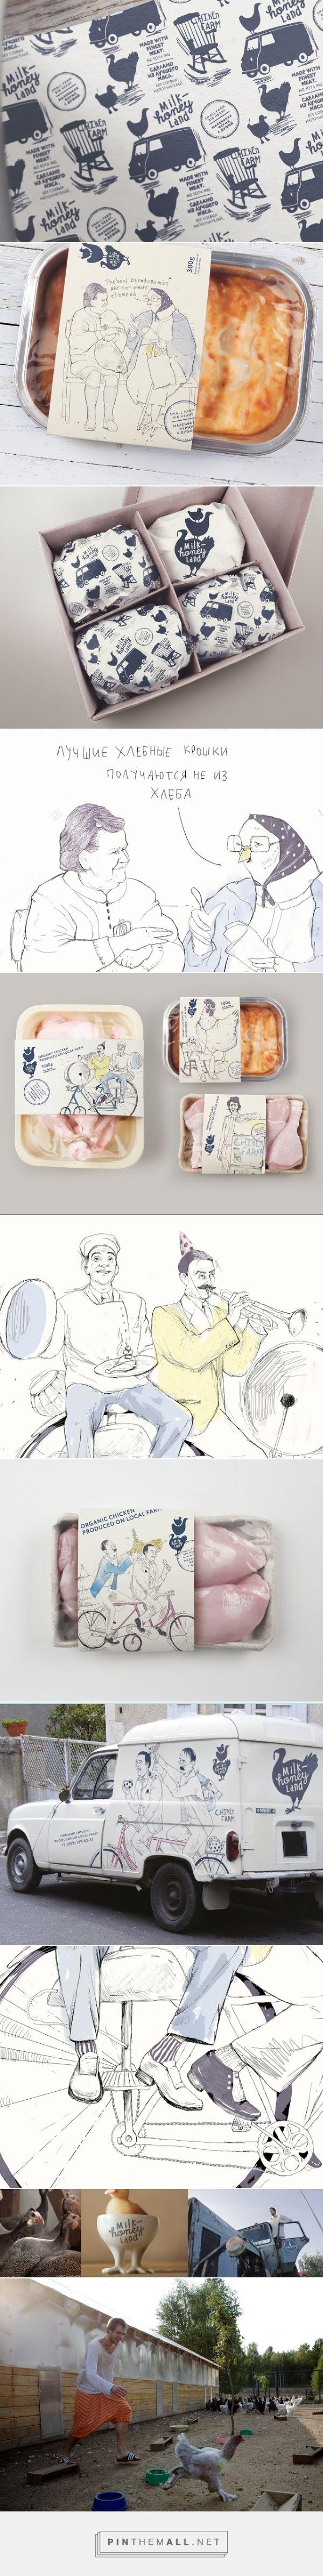 Milk & Honey Land #packaging designed by Брендинговое агентство Depot WPF - http://www.packagingoftheworld.com/2015/07/milk-honey-land.html